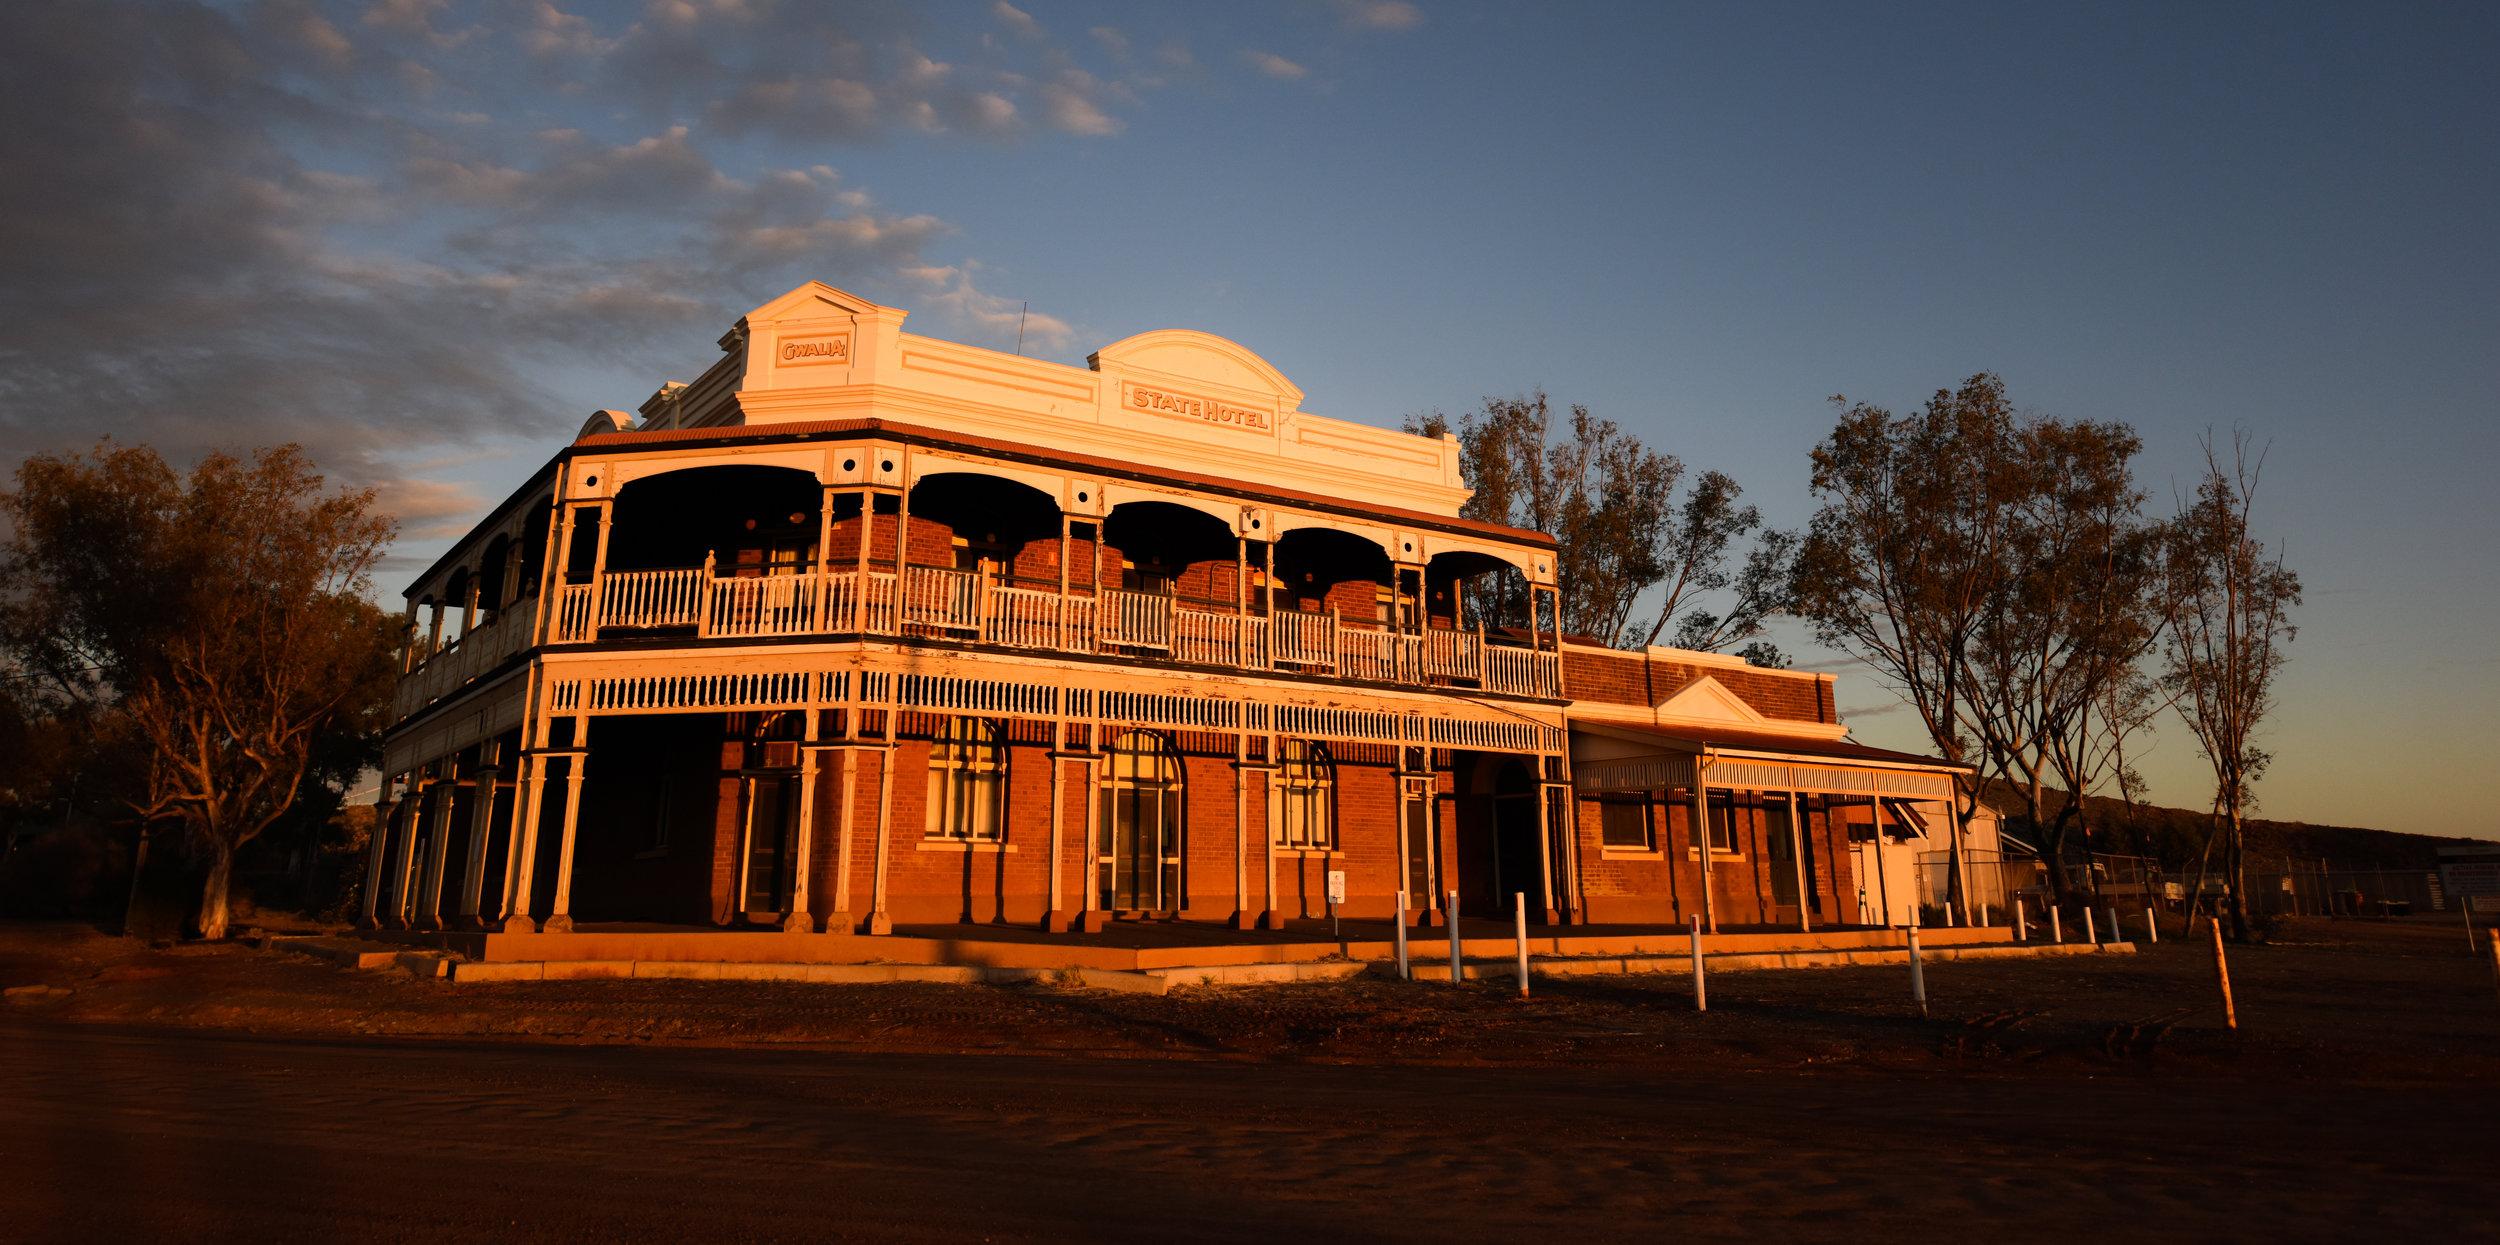 Gwalia's State Hotel. Photo credit: Kate Ferguson